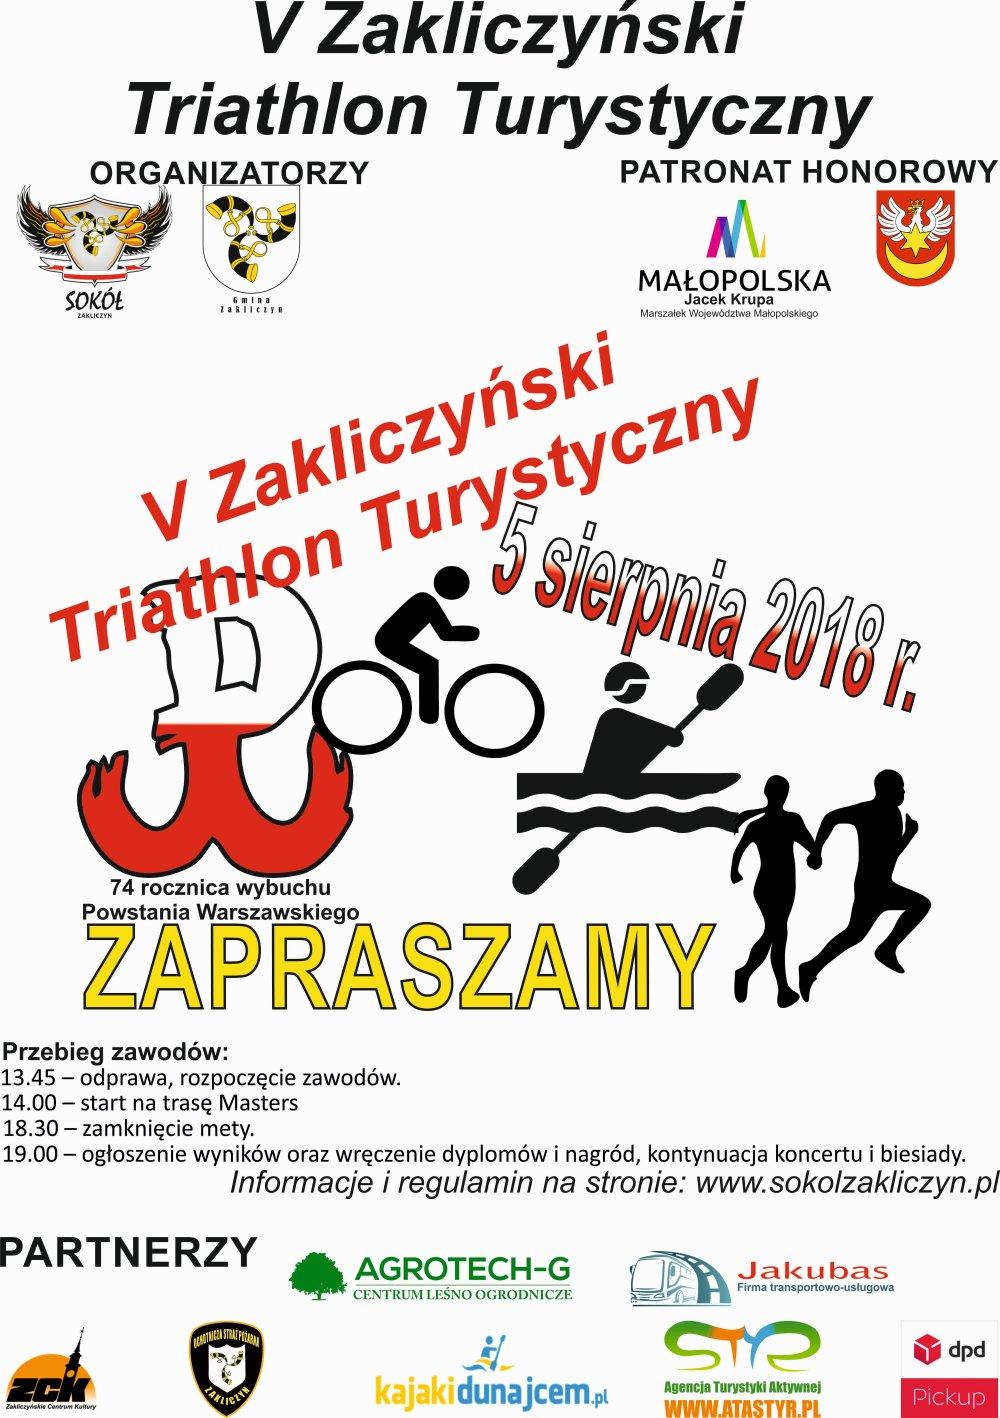 V Zakliczyński Triathlon Turystyczny, 5 sierpnia 2018 r., plakat imprezy